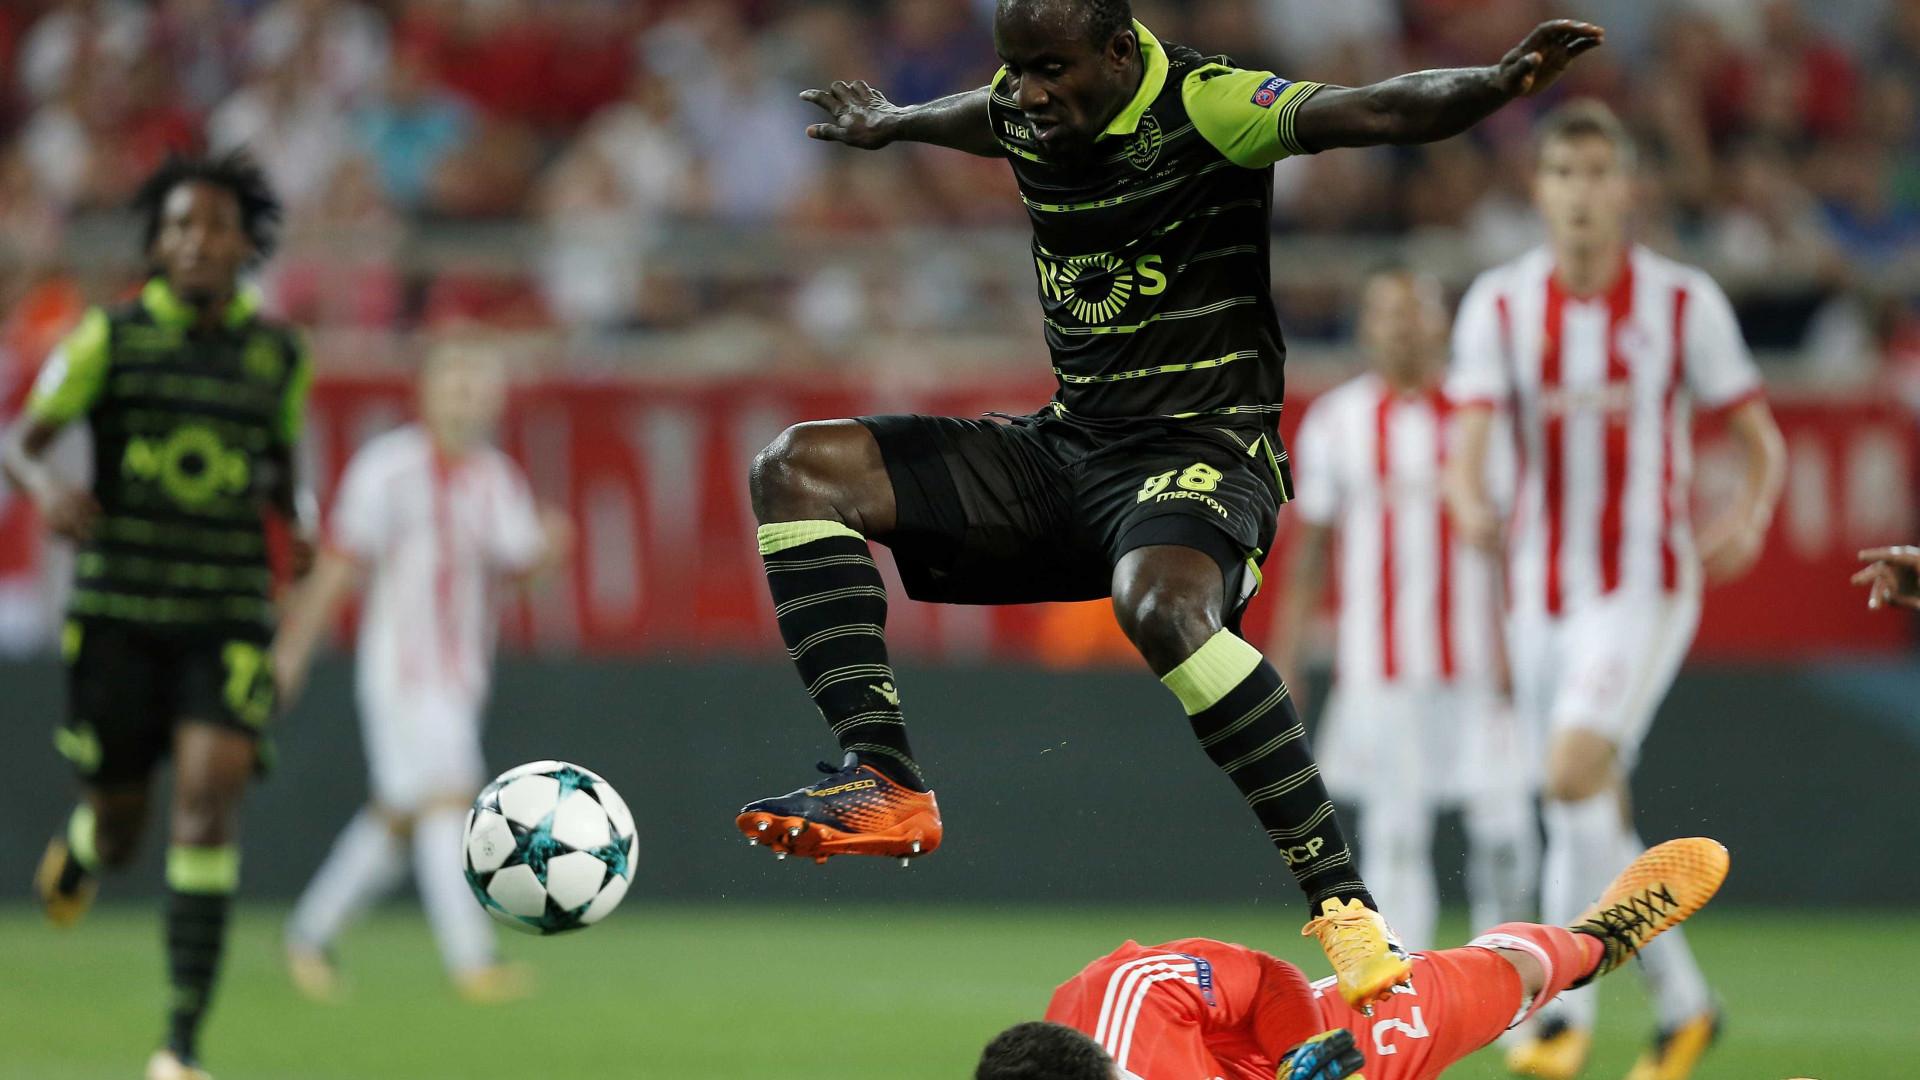 Ingleses do Everton perguntam por Doumbia